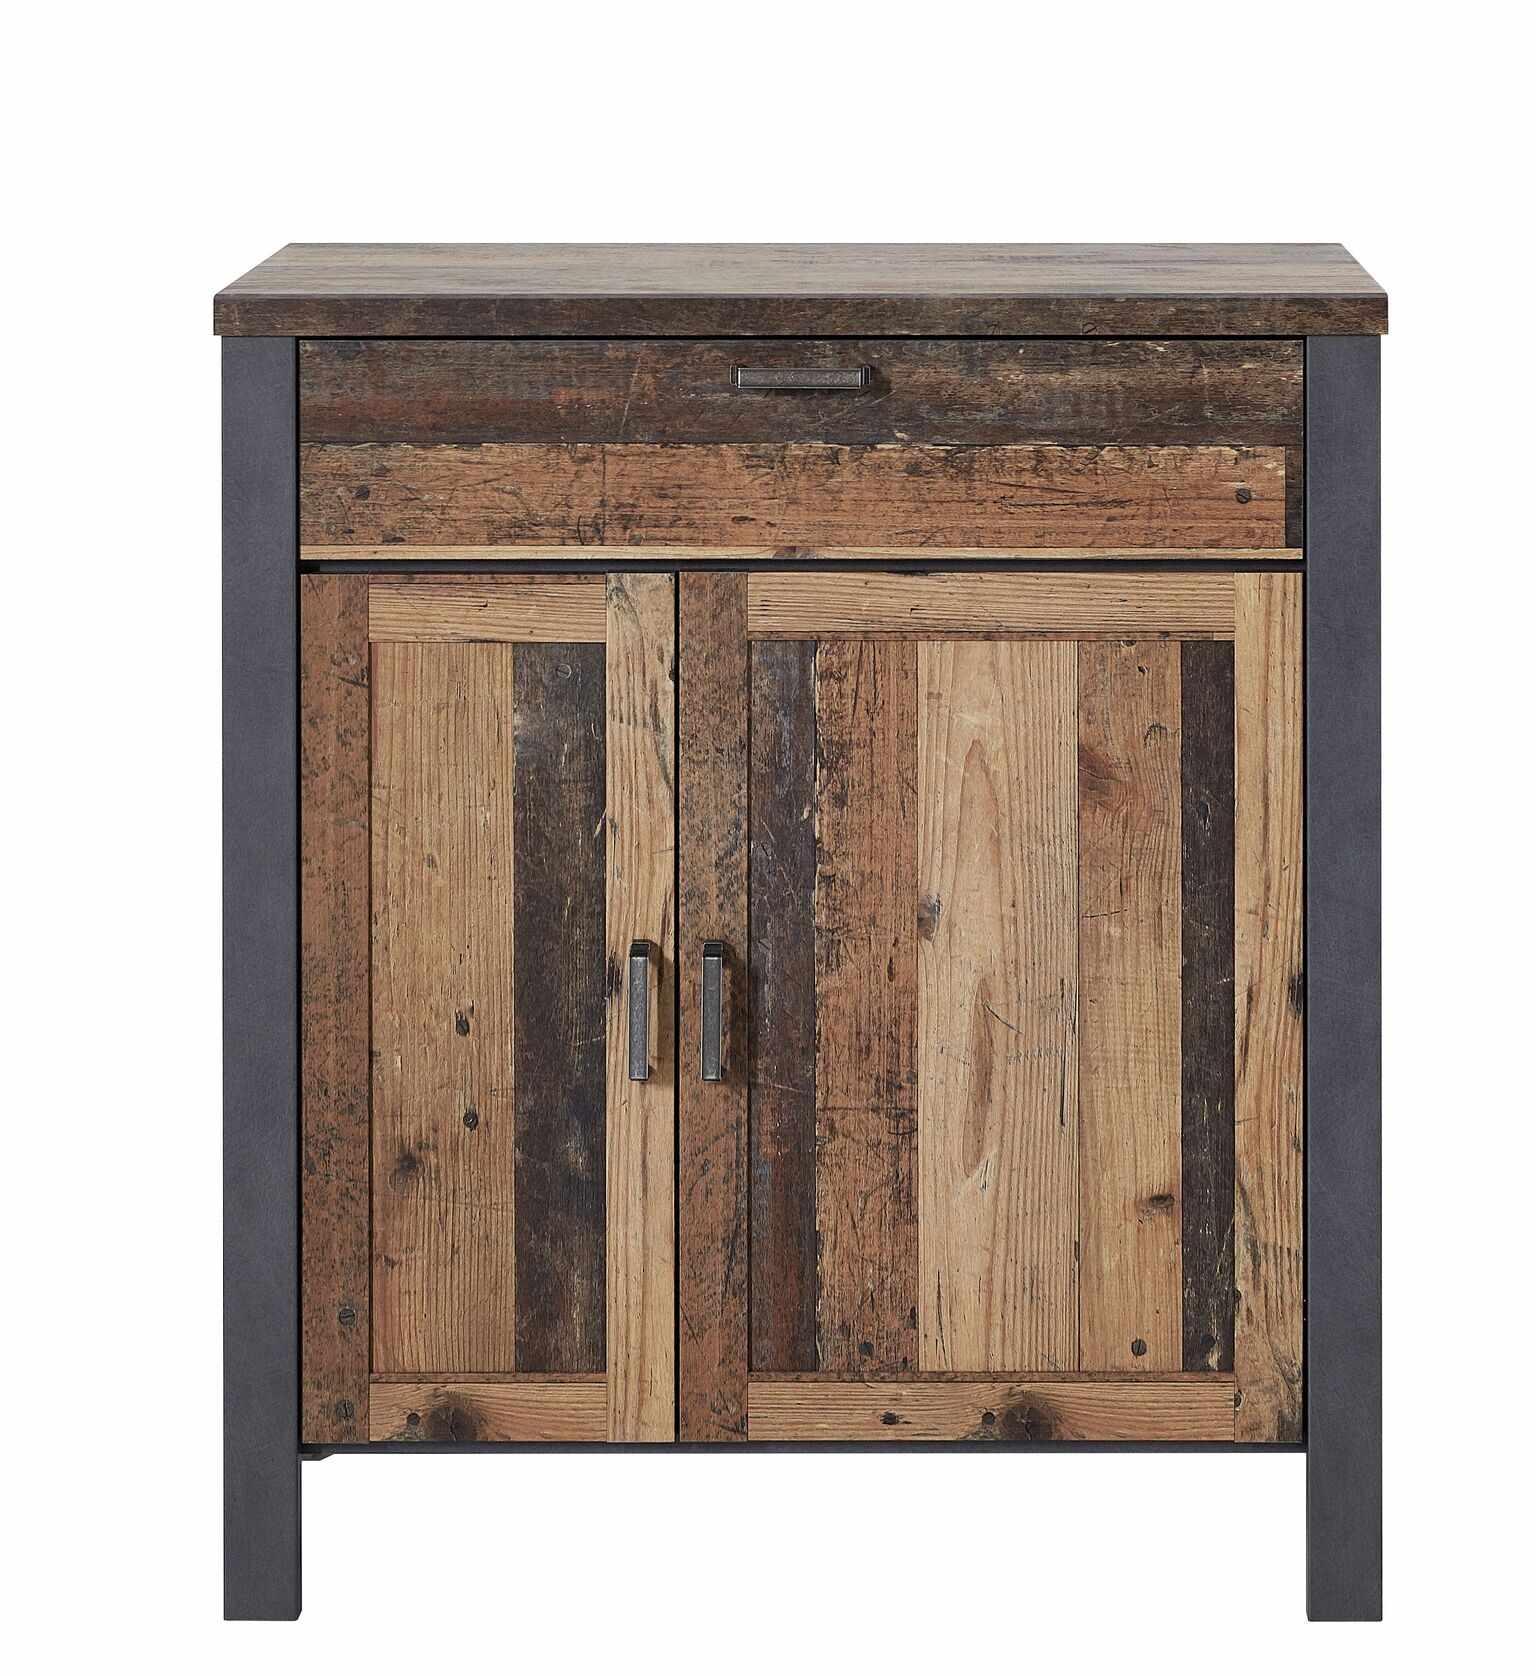 Cabinet din pal cu 2 usi si 1 sertar Chelsea Natural / Grafit, l94xA40xH105 cm la pret 1527 lei